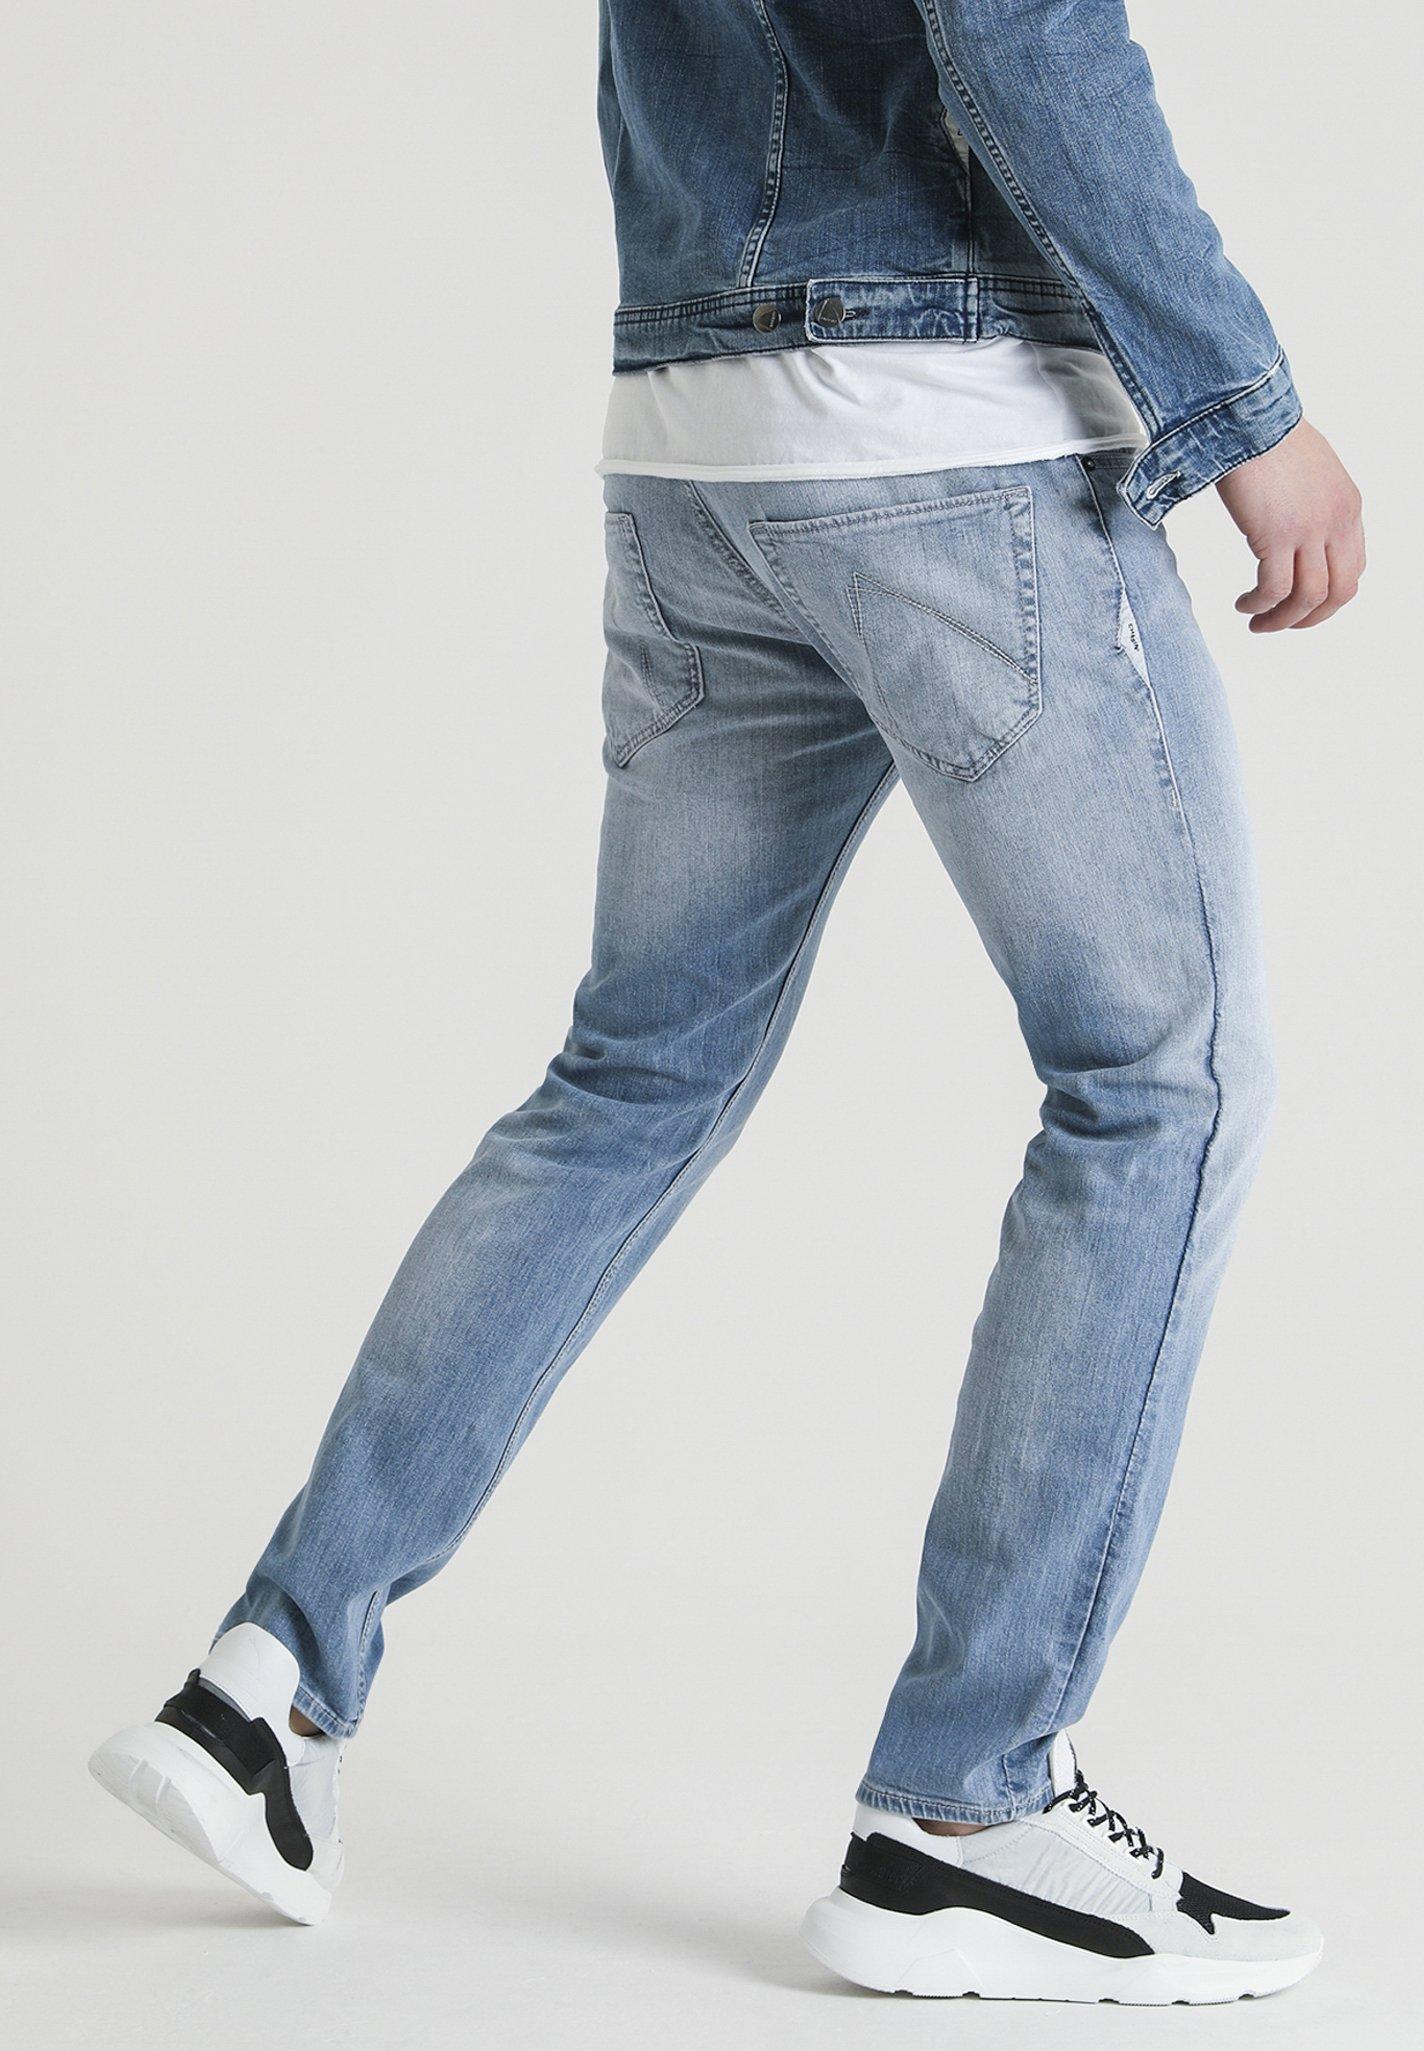 CHASIN' Straight leg jeans - blue  Heren jeans paw2E